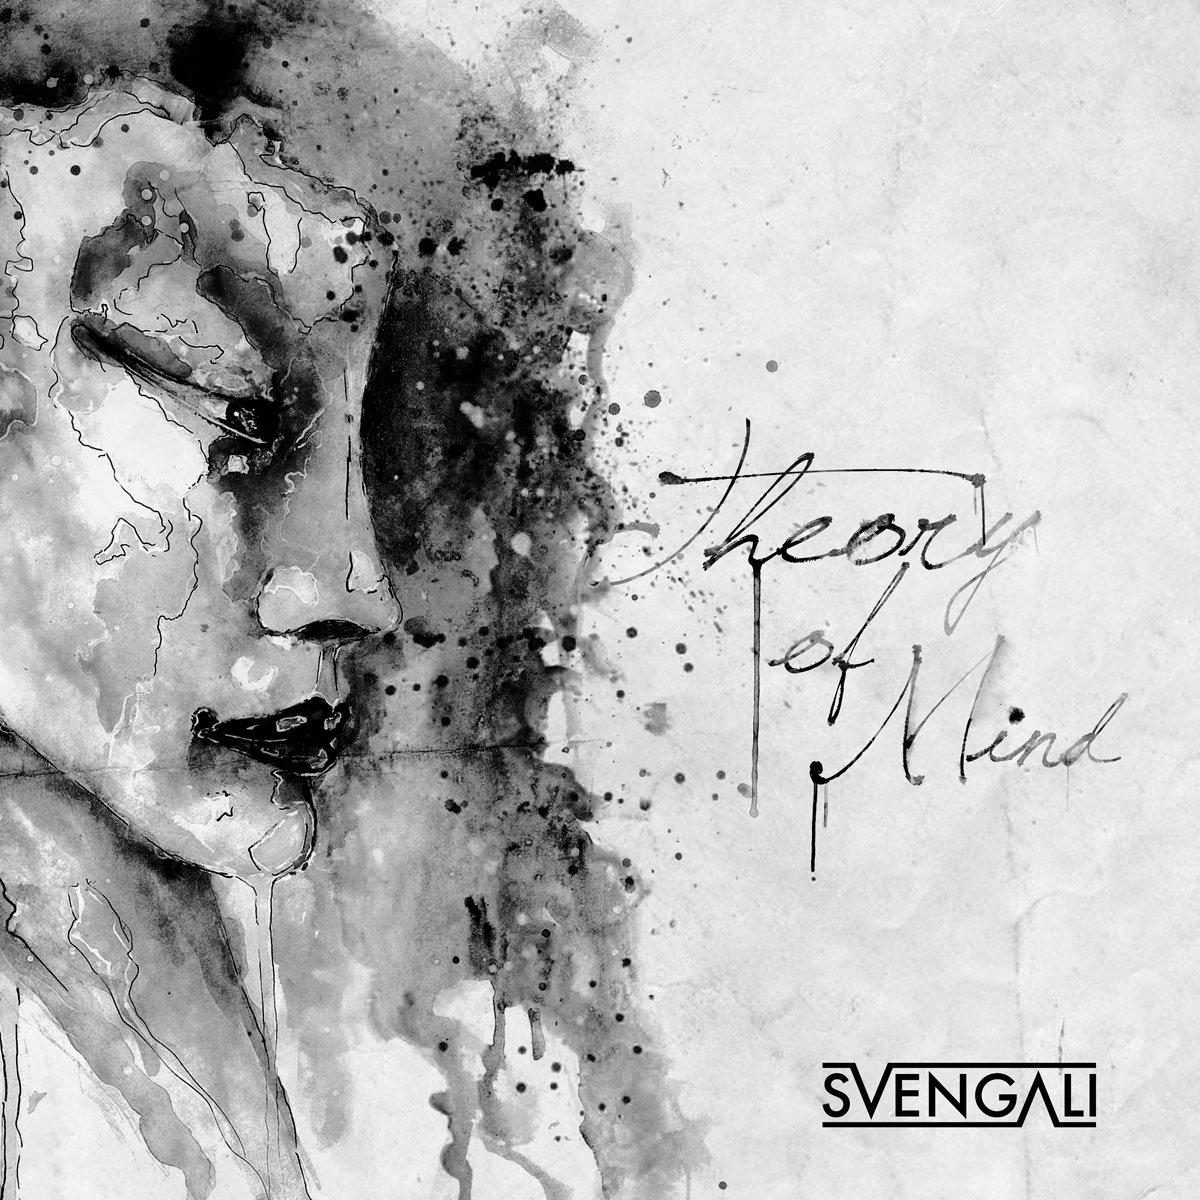 Svengali: Theory of Mind